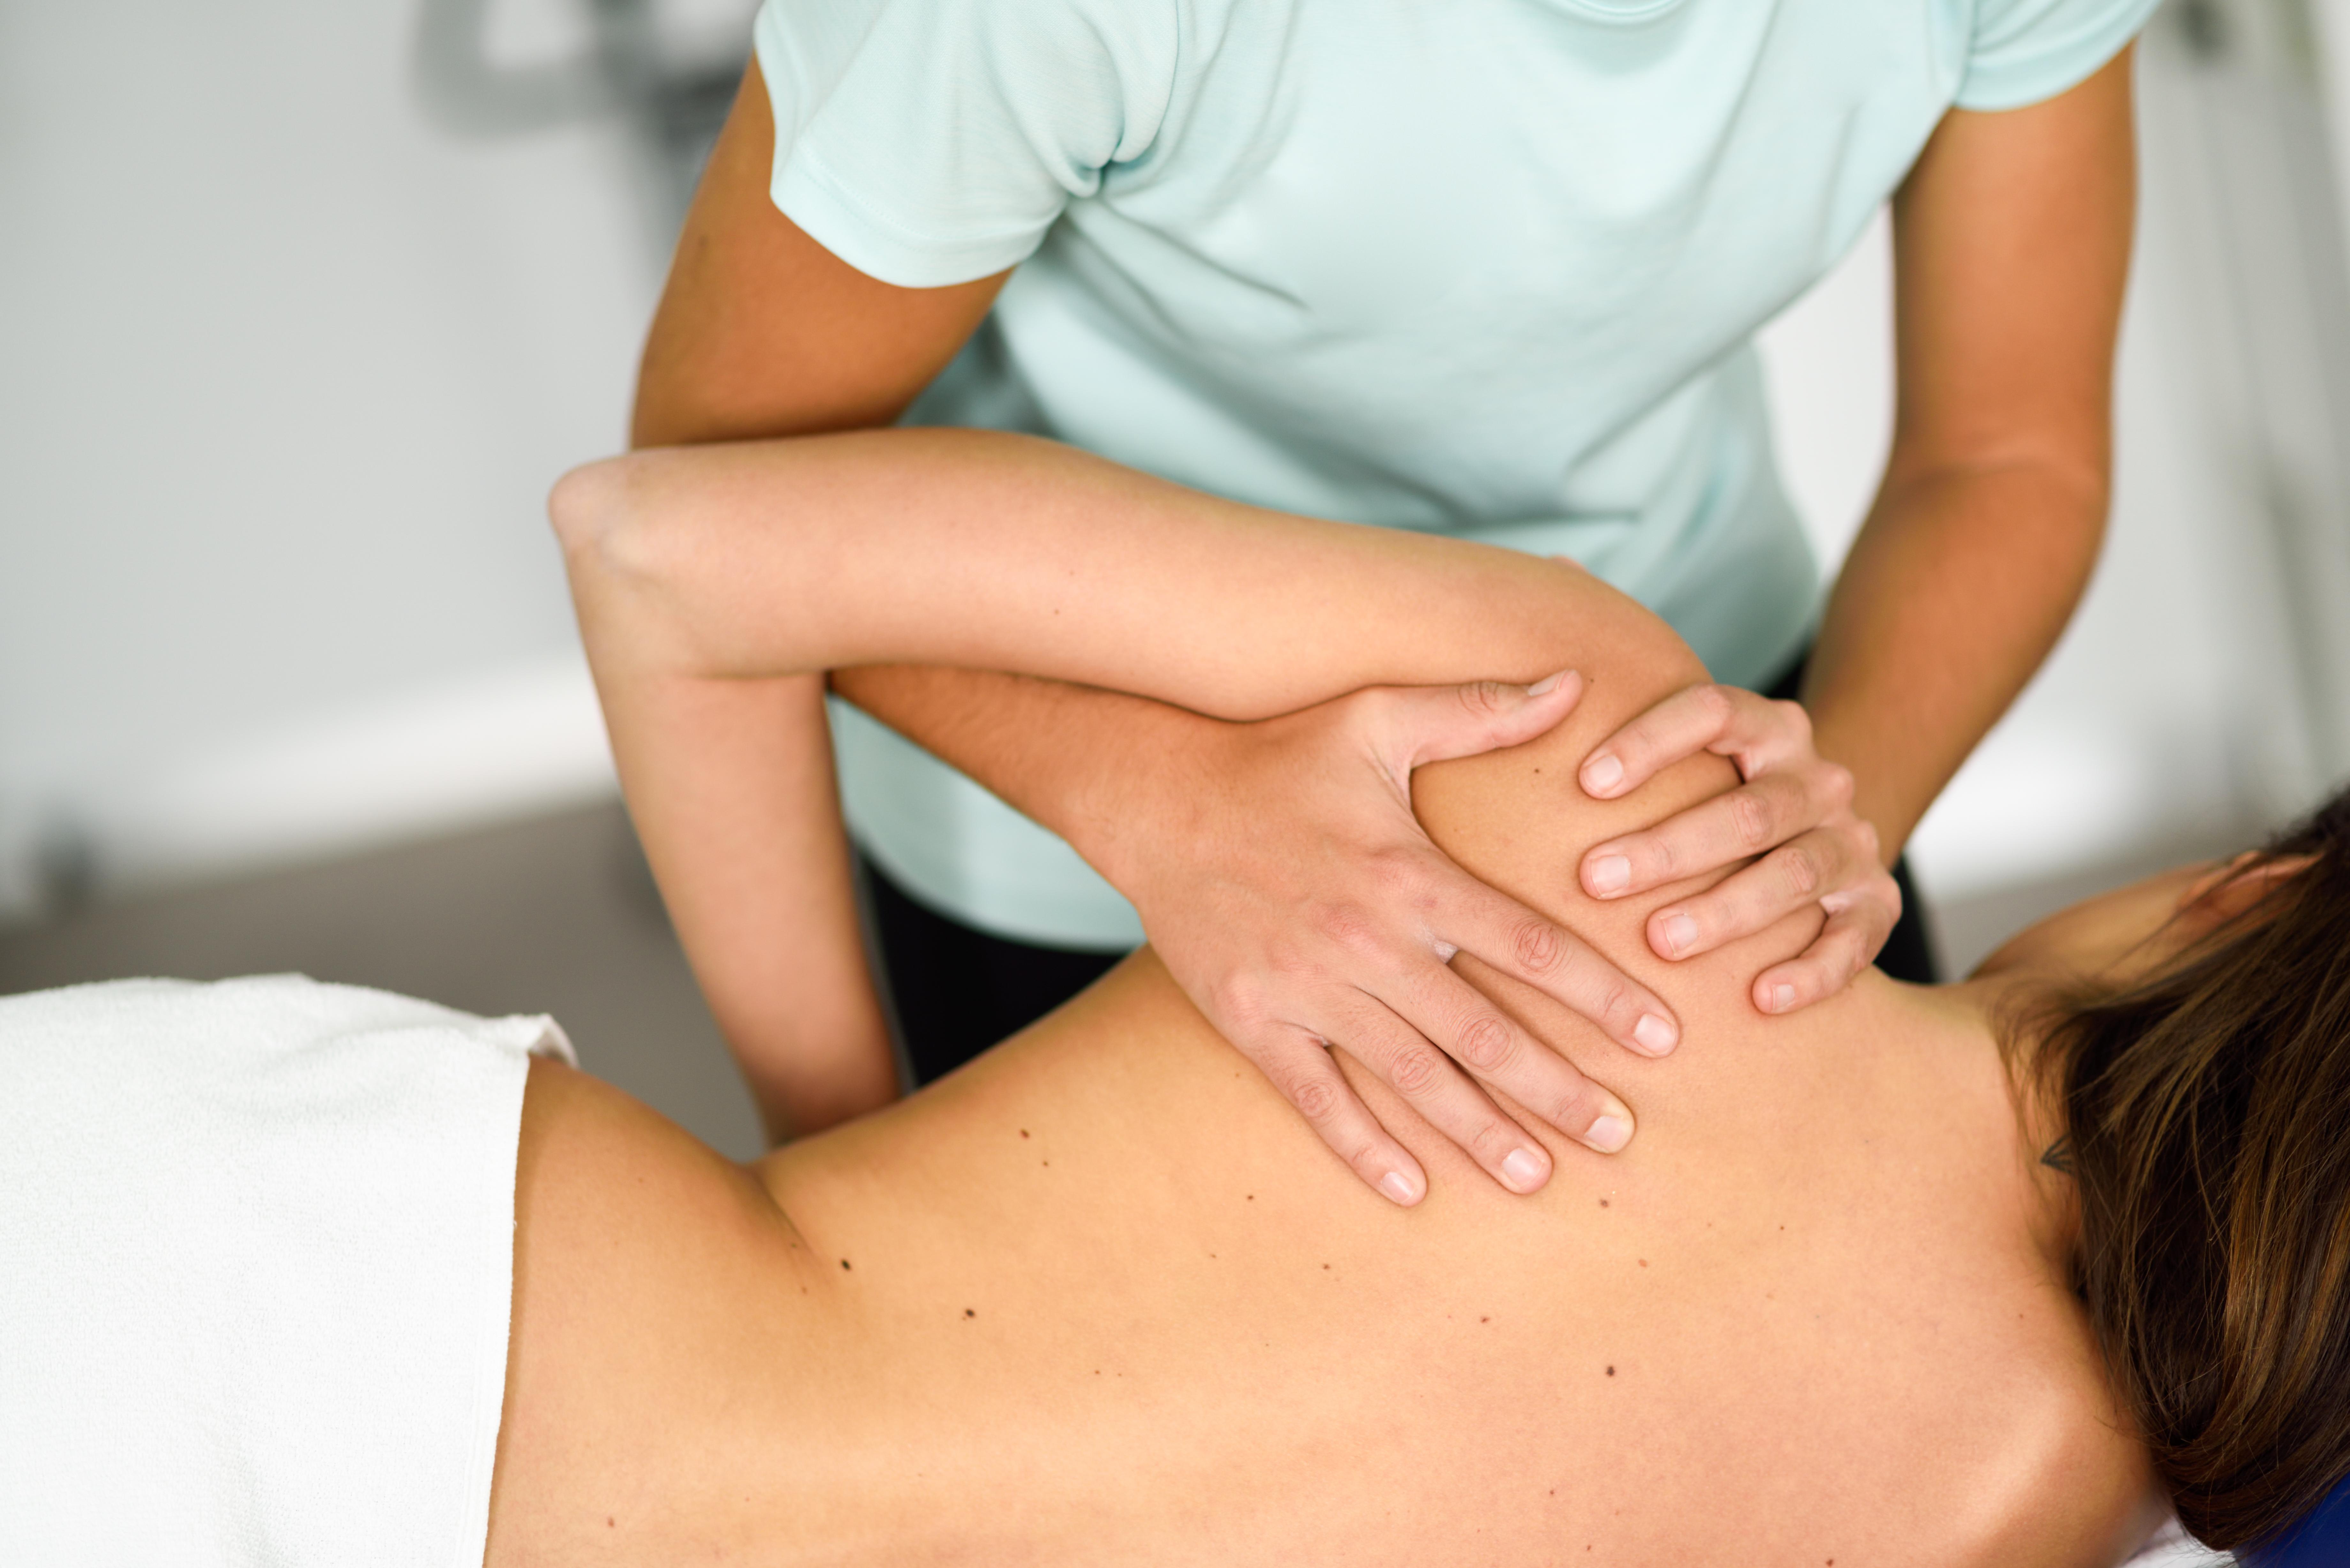 sindrome de fibromialgia y fatiga